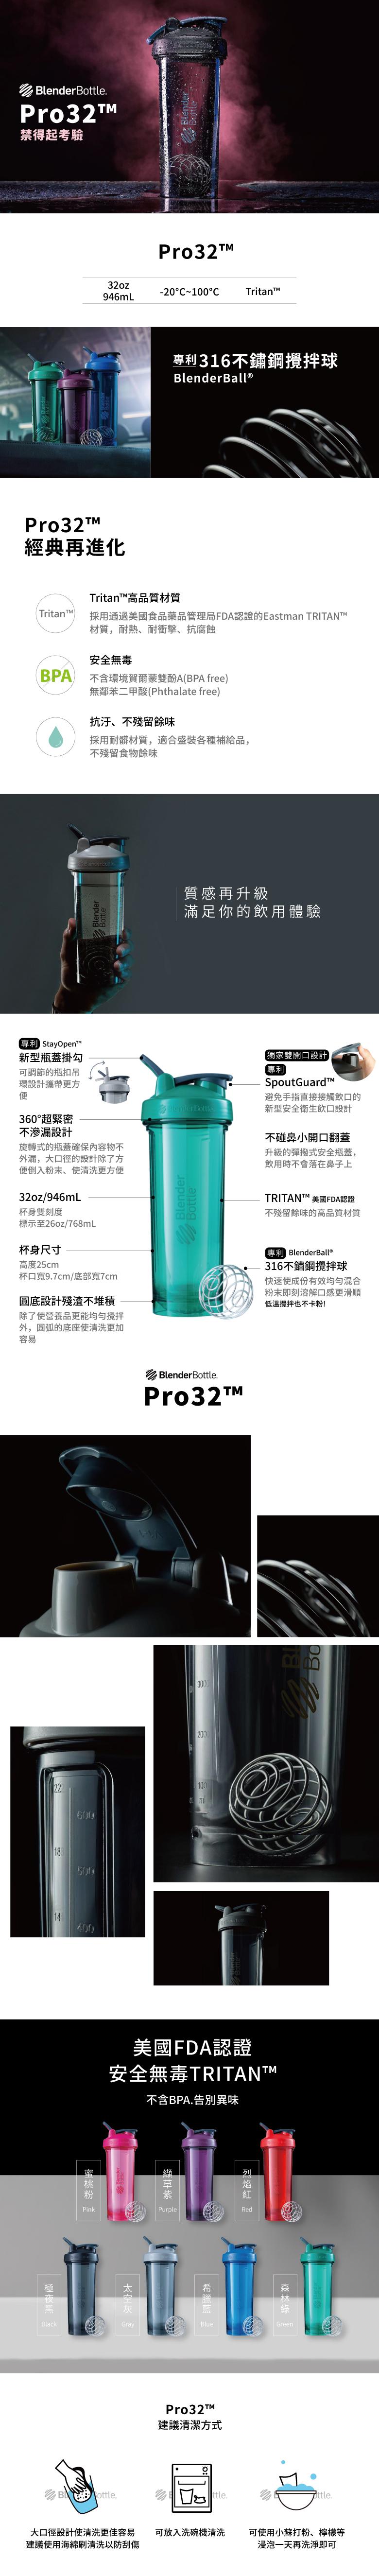 Blender Bottle 《Pro32系列》高透視機能搖搖杯-浩克(綠)